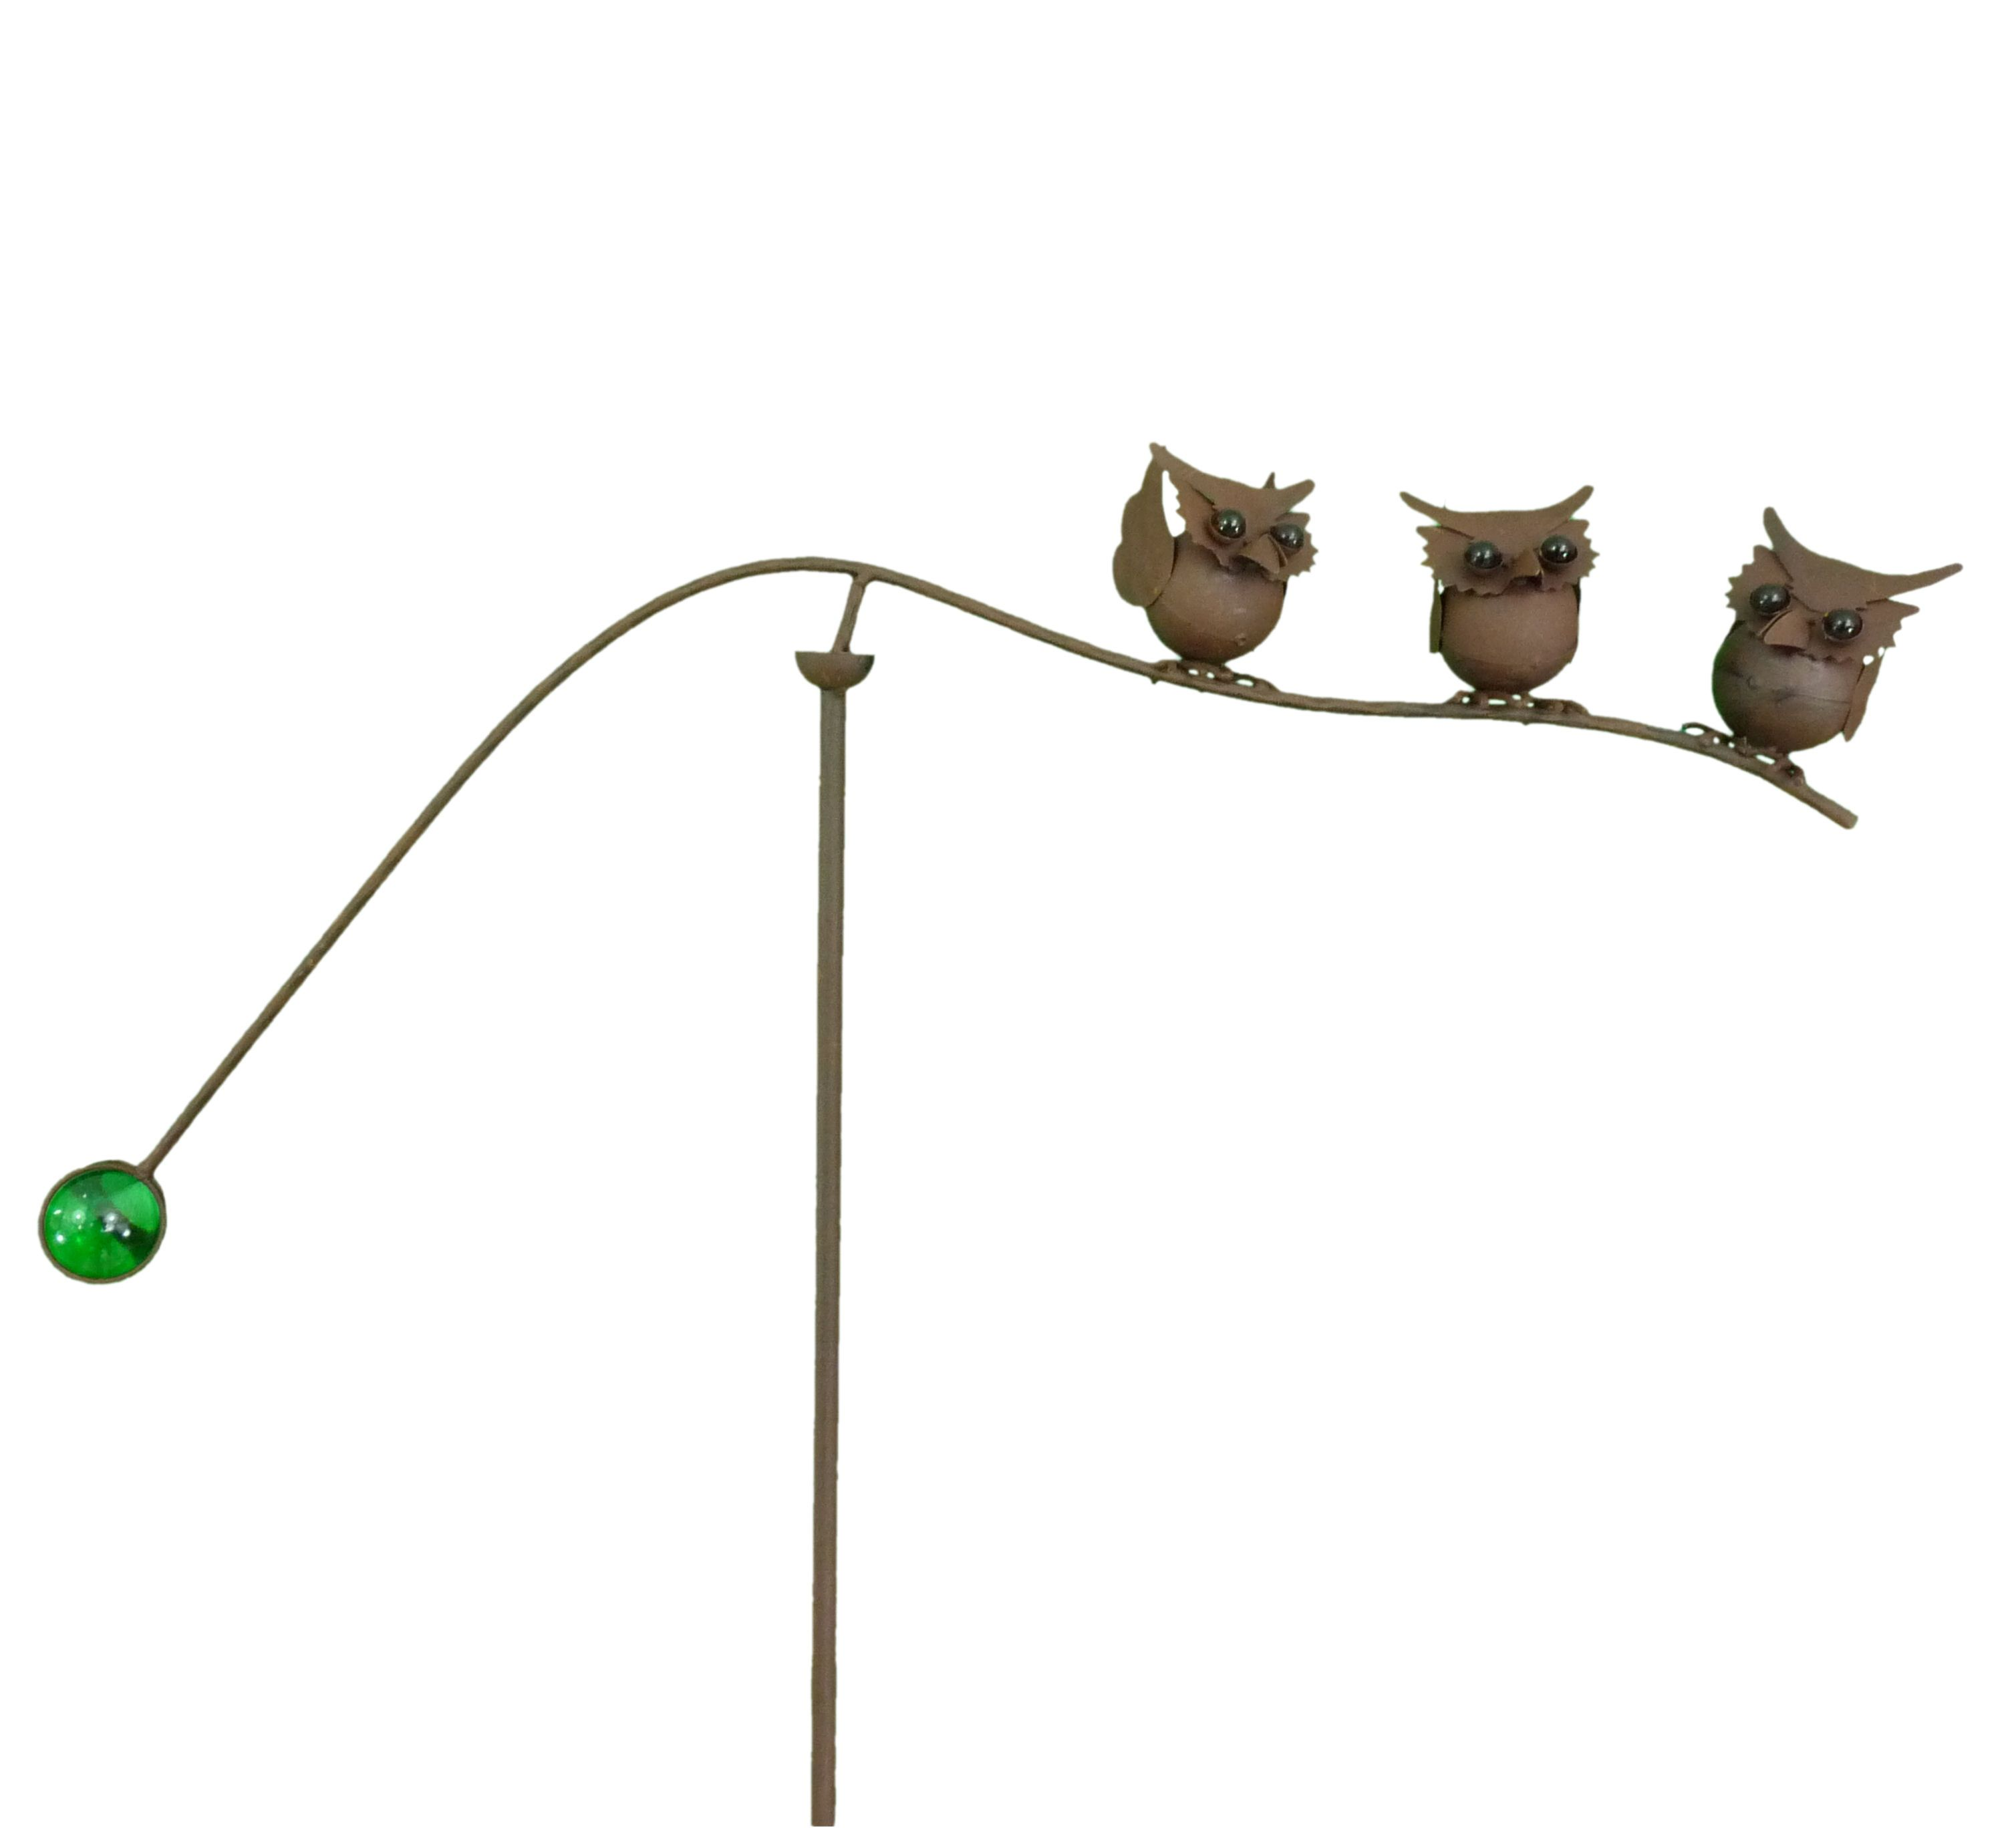 Spinning Balancing Trio Of Owls Metal Garden Wind Spinner Ornament Animal